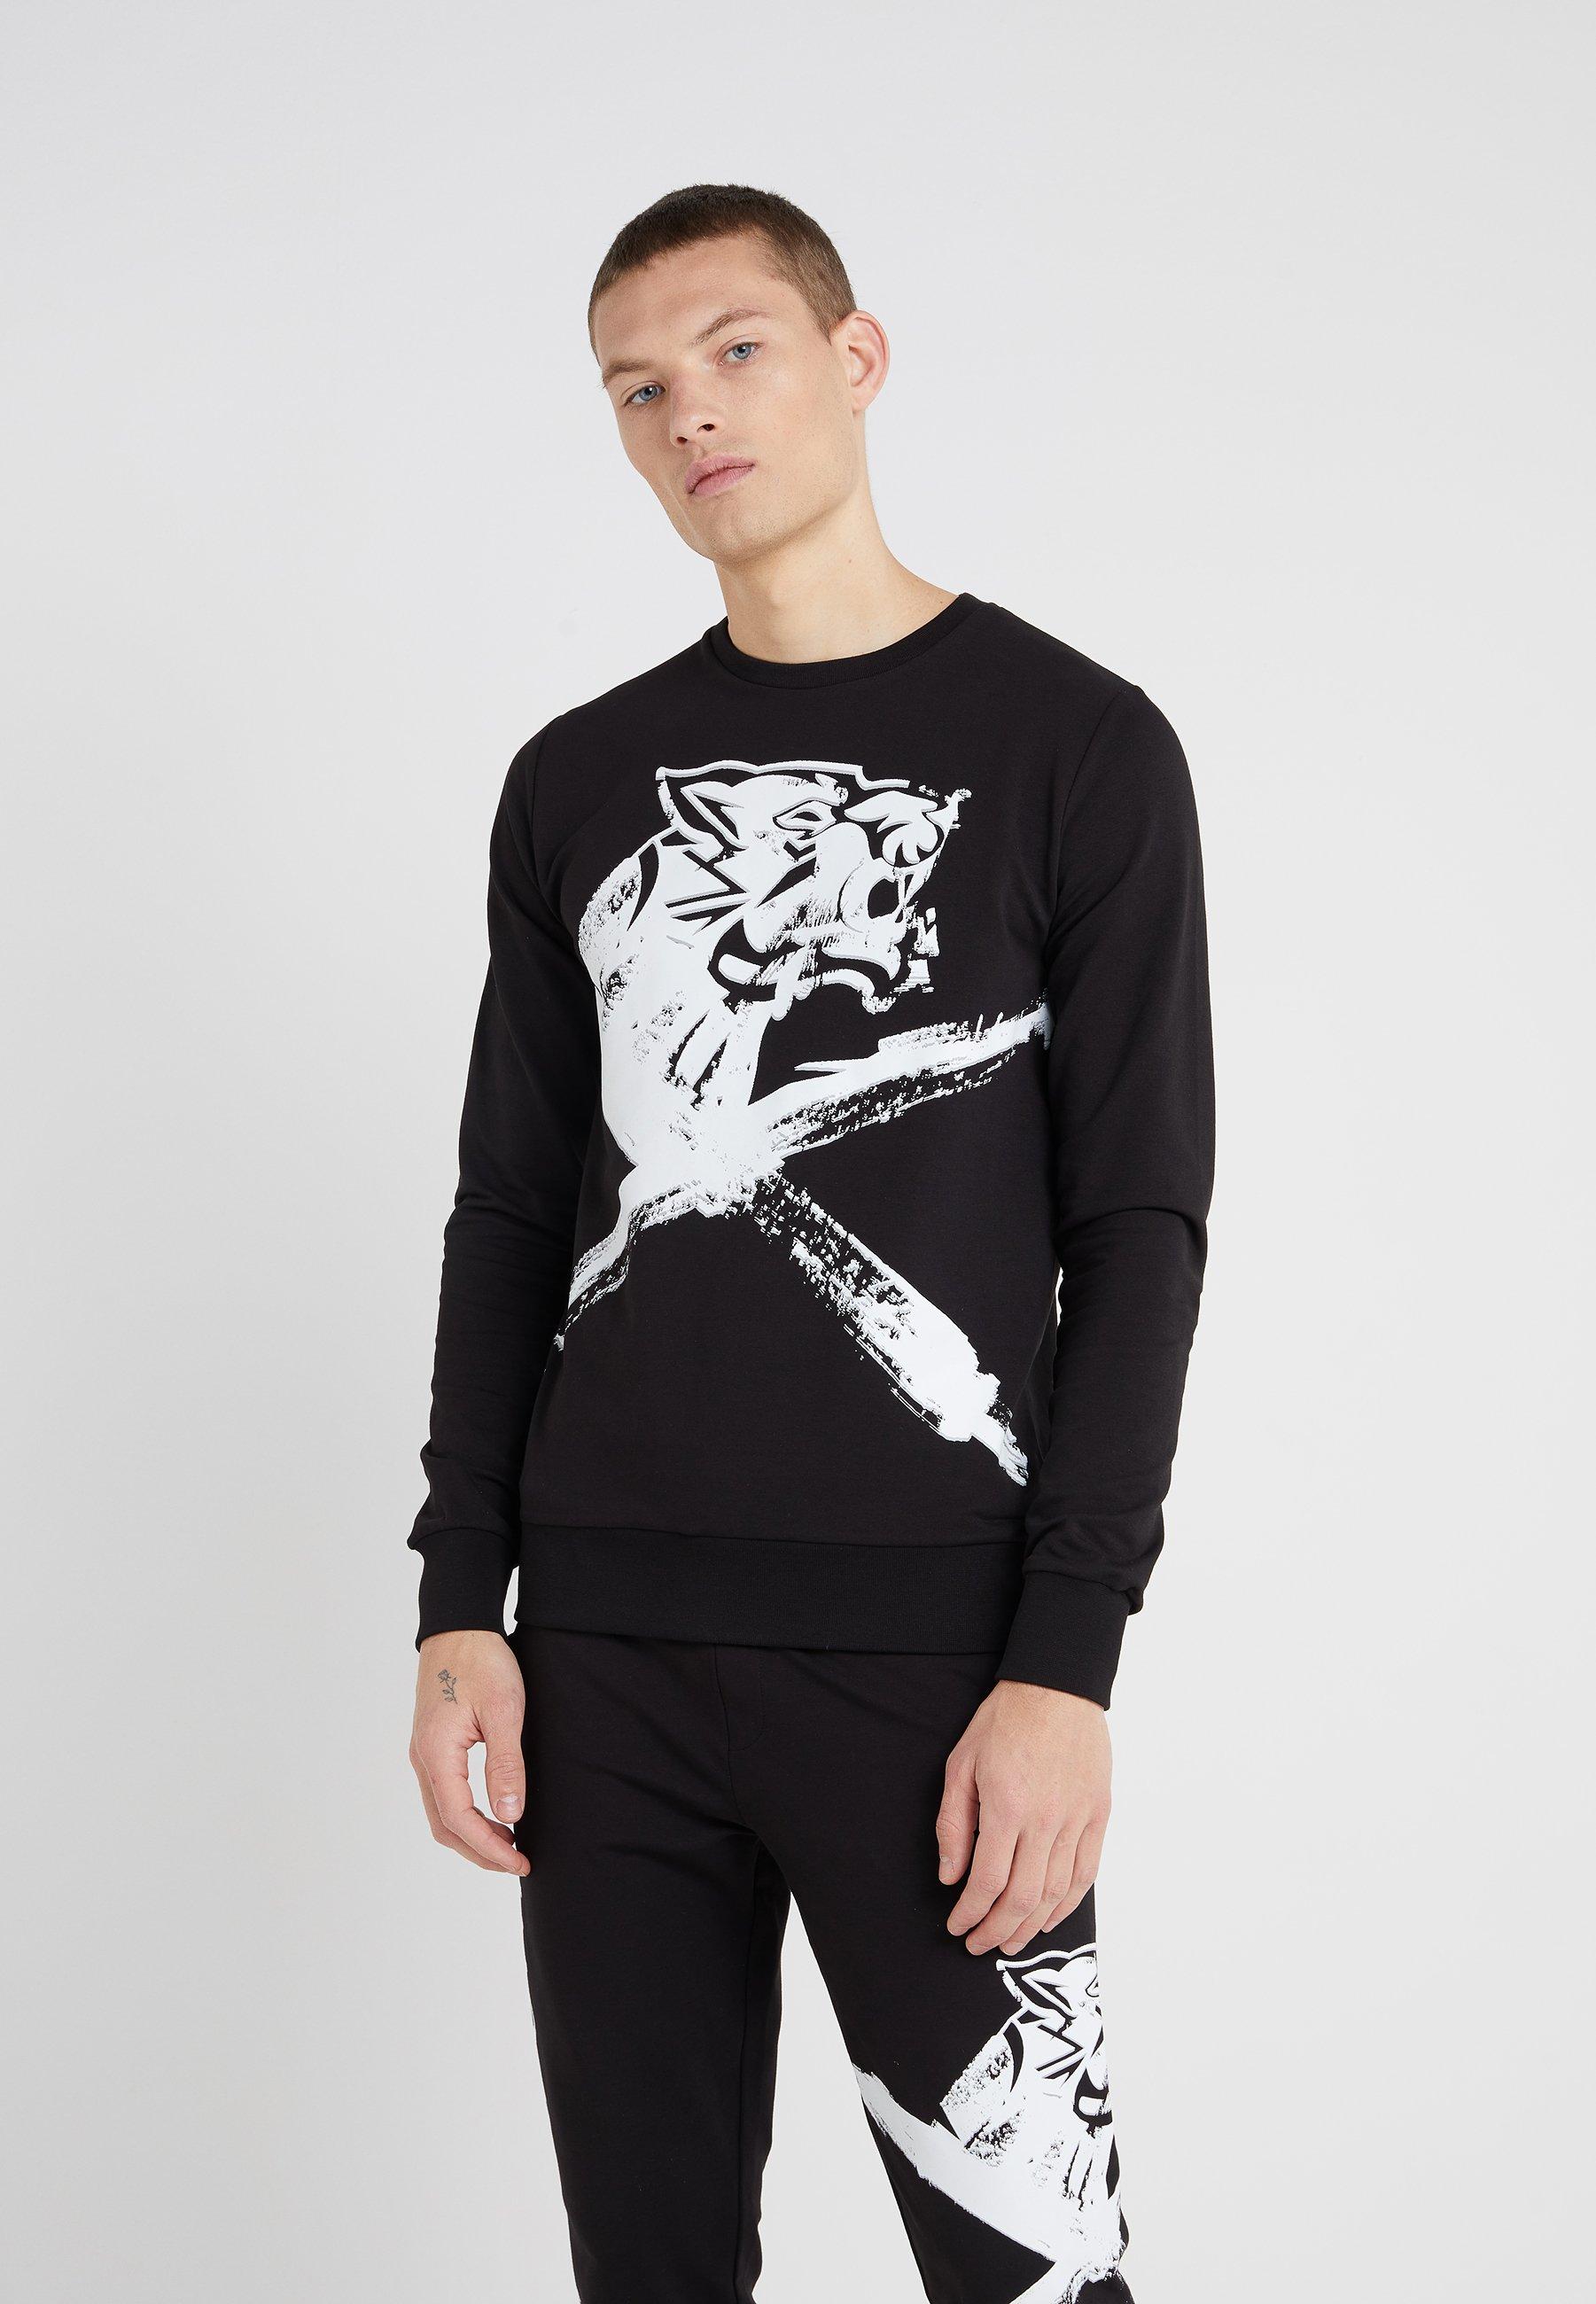 TigerSweatshirt Plein Cross Cross Plein Black Plein Sport Black Cross Sport TigerSweatshirt Sport ALqcj354R